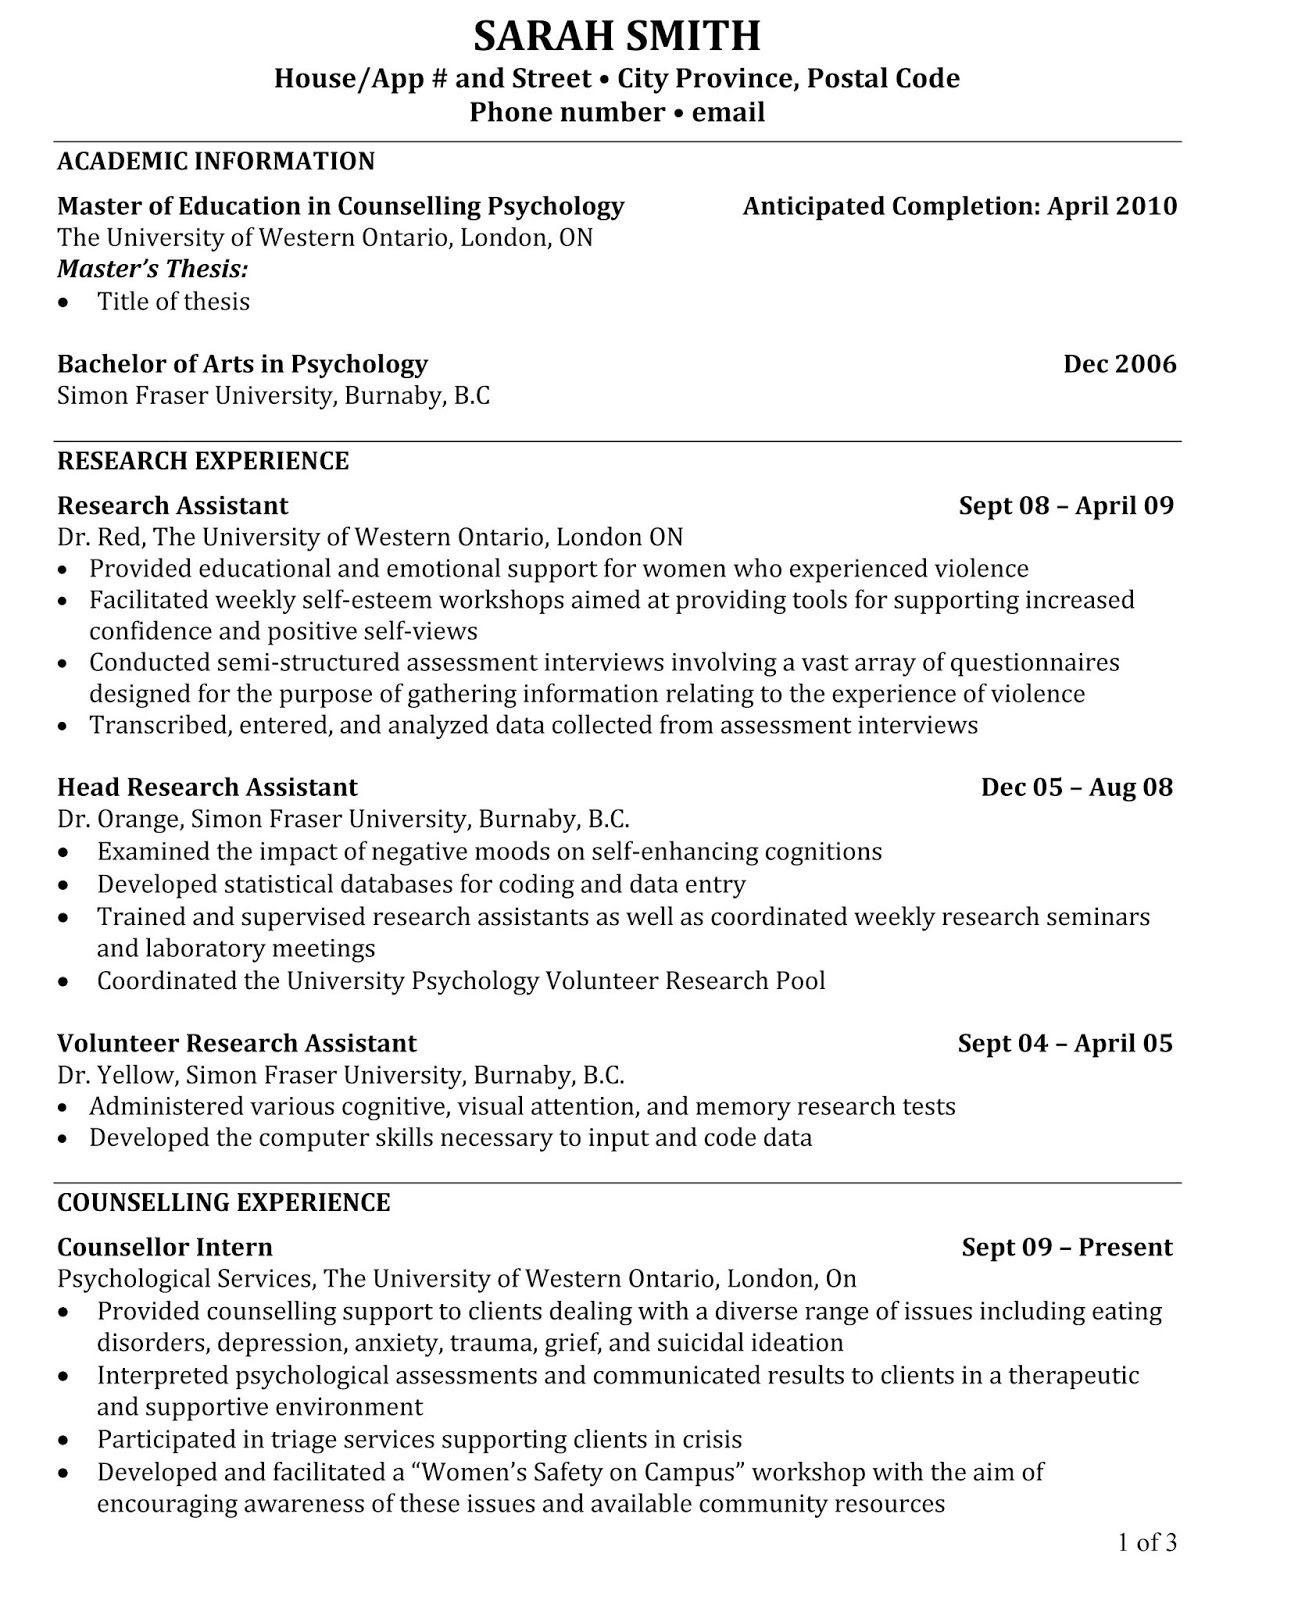 Academic Resume Sample Academic Resume Sample Pdf Academic Resume Sample 2019 Academic Resume Sample For Student Resume Template Academic Cv Student Resume